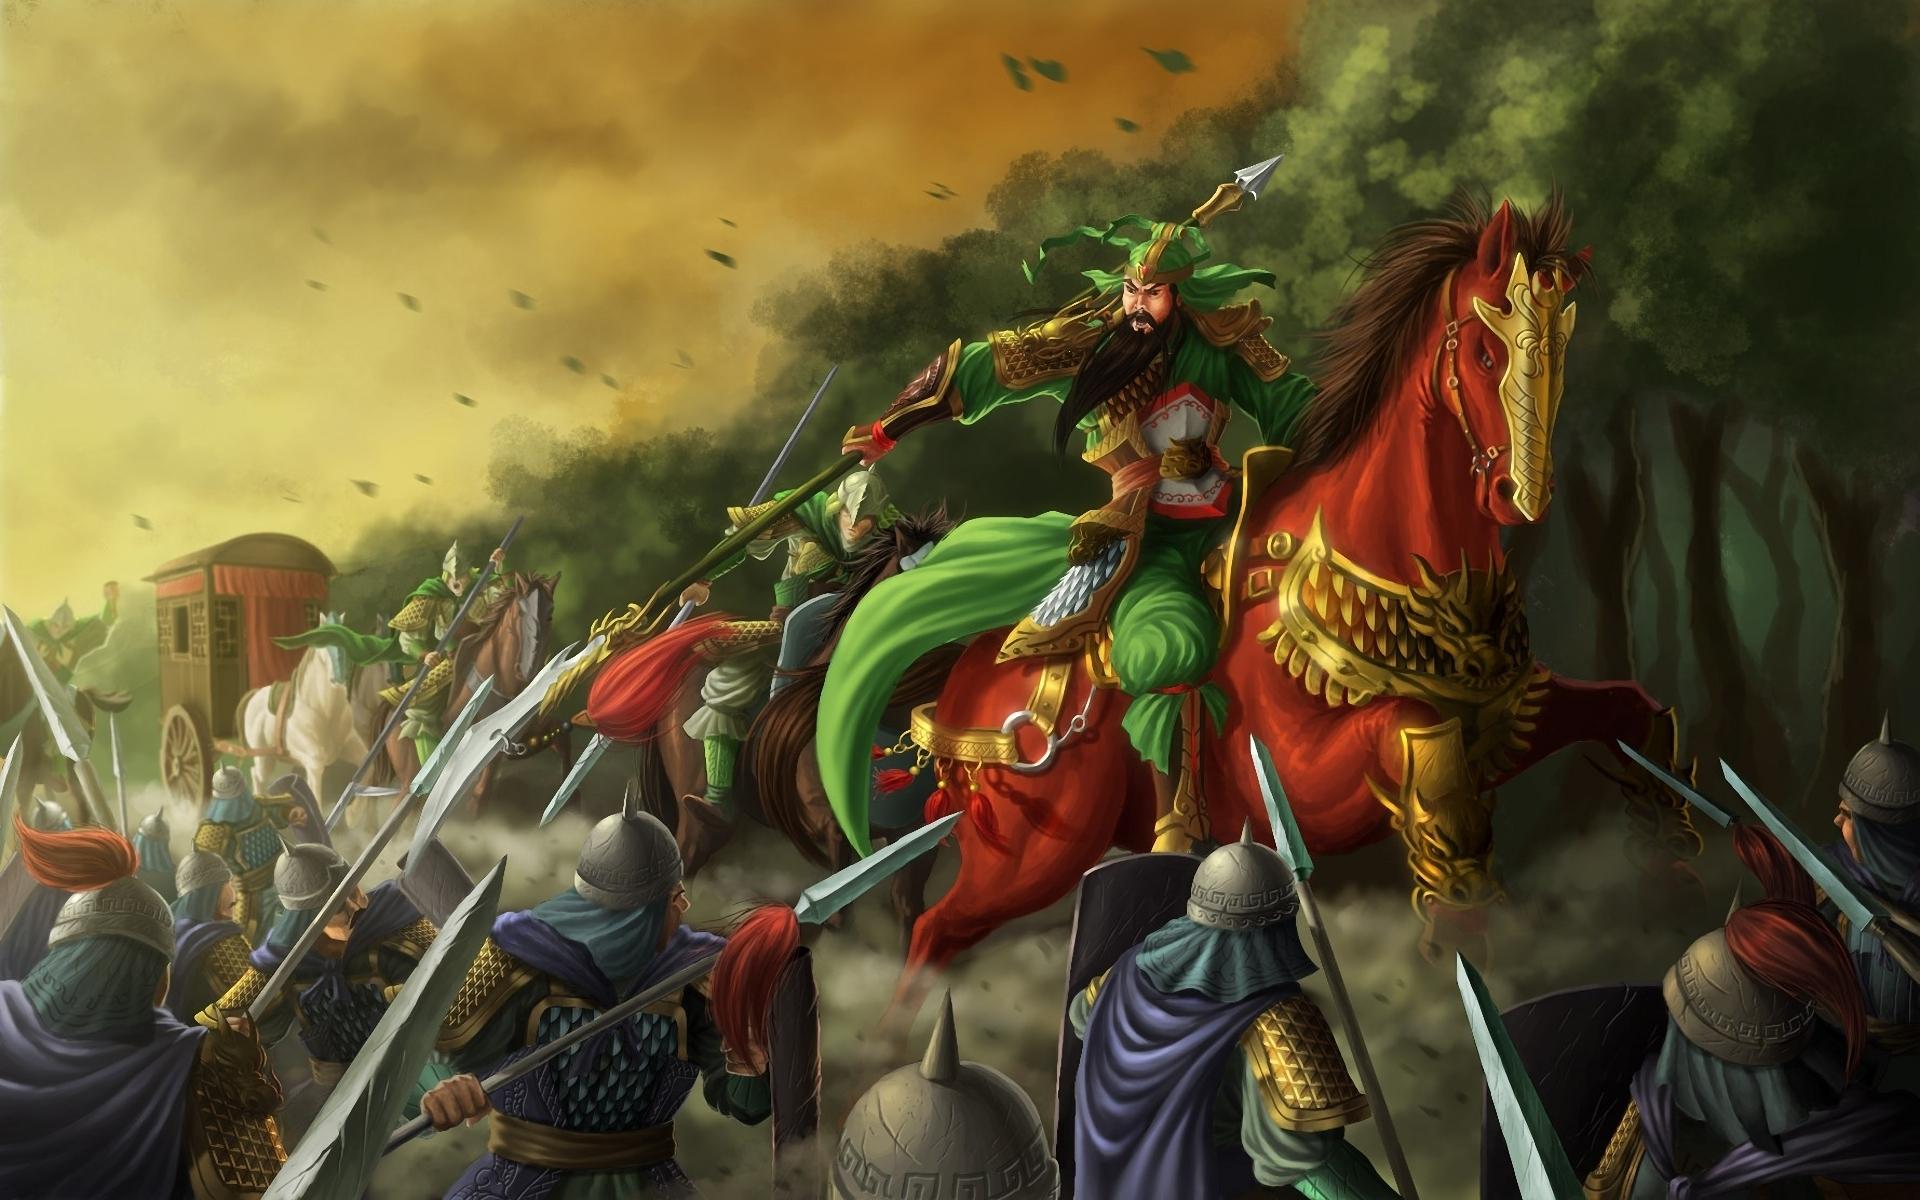 1 Guan Yu HD Wallpapers | Backgrounds - Wallpaper Abyss